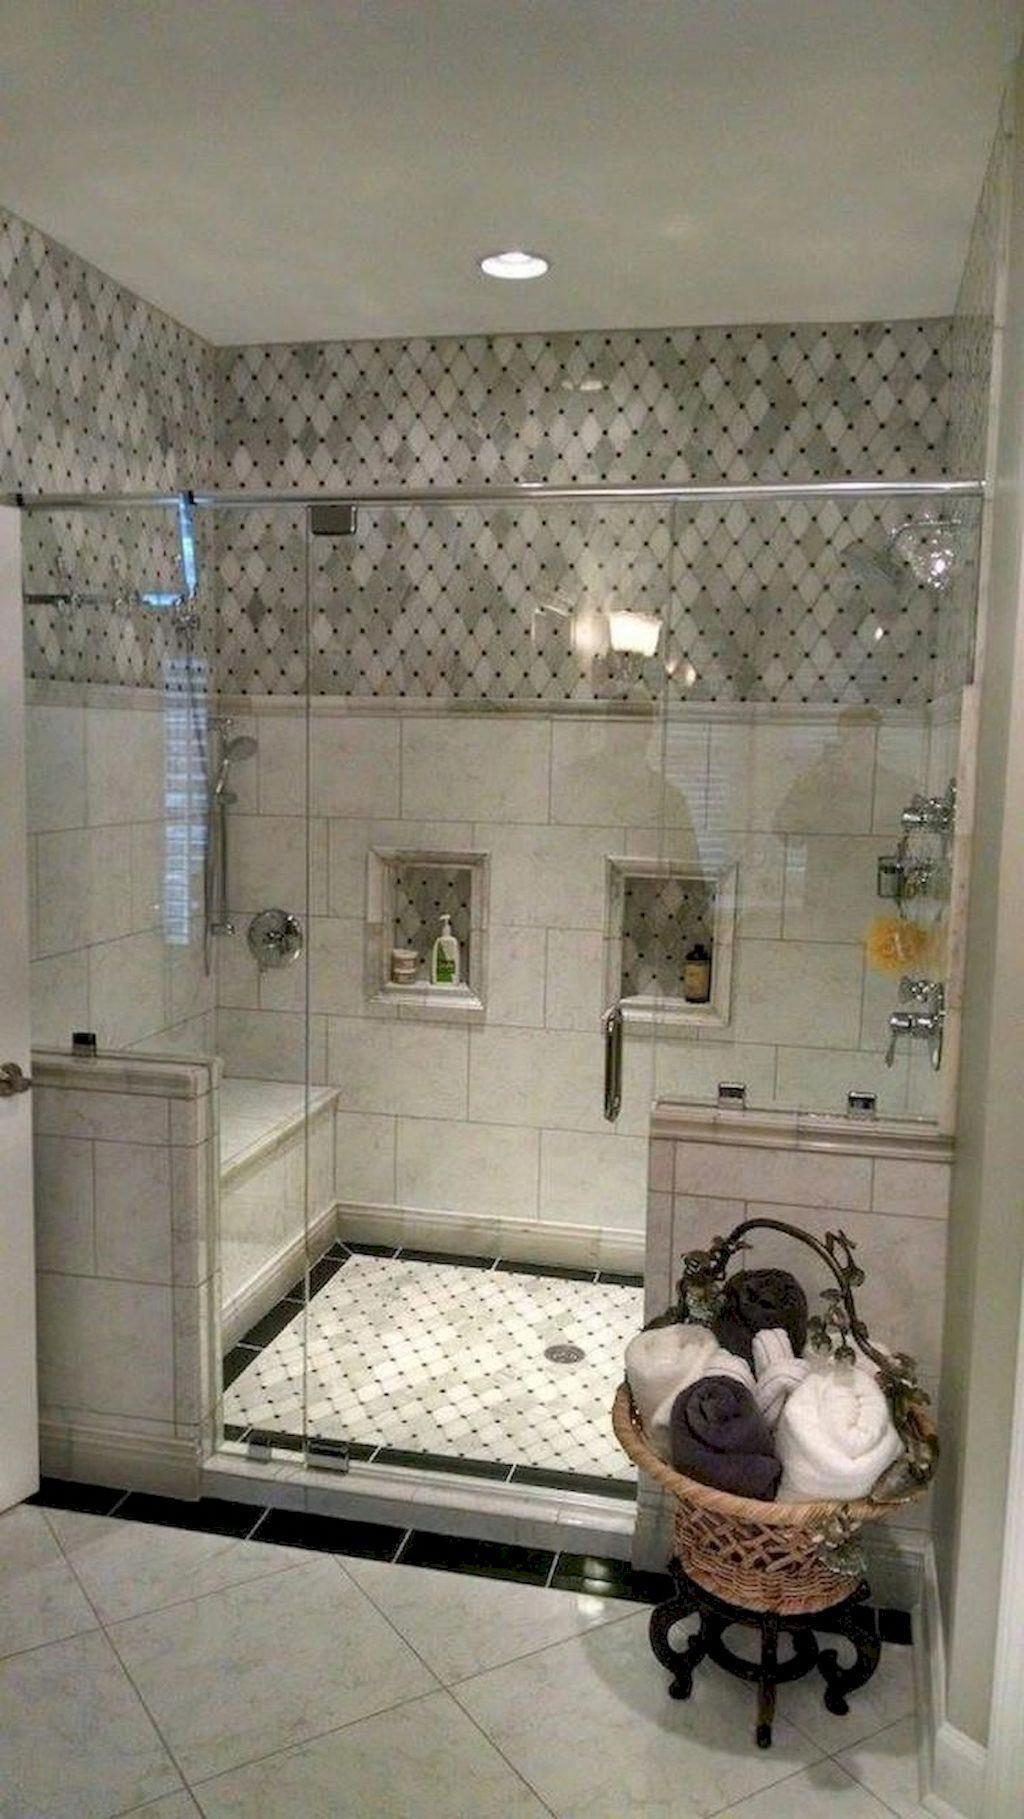 Bathroom Set Ideas Matching Bathroom Accessories Sets His Hers Bathroom Decor 20190326 Bathroom Remodel Shower Small Bathroom Remodel Bathrooms Remodel